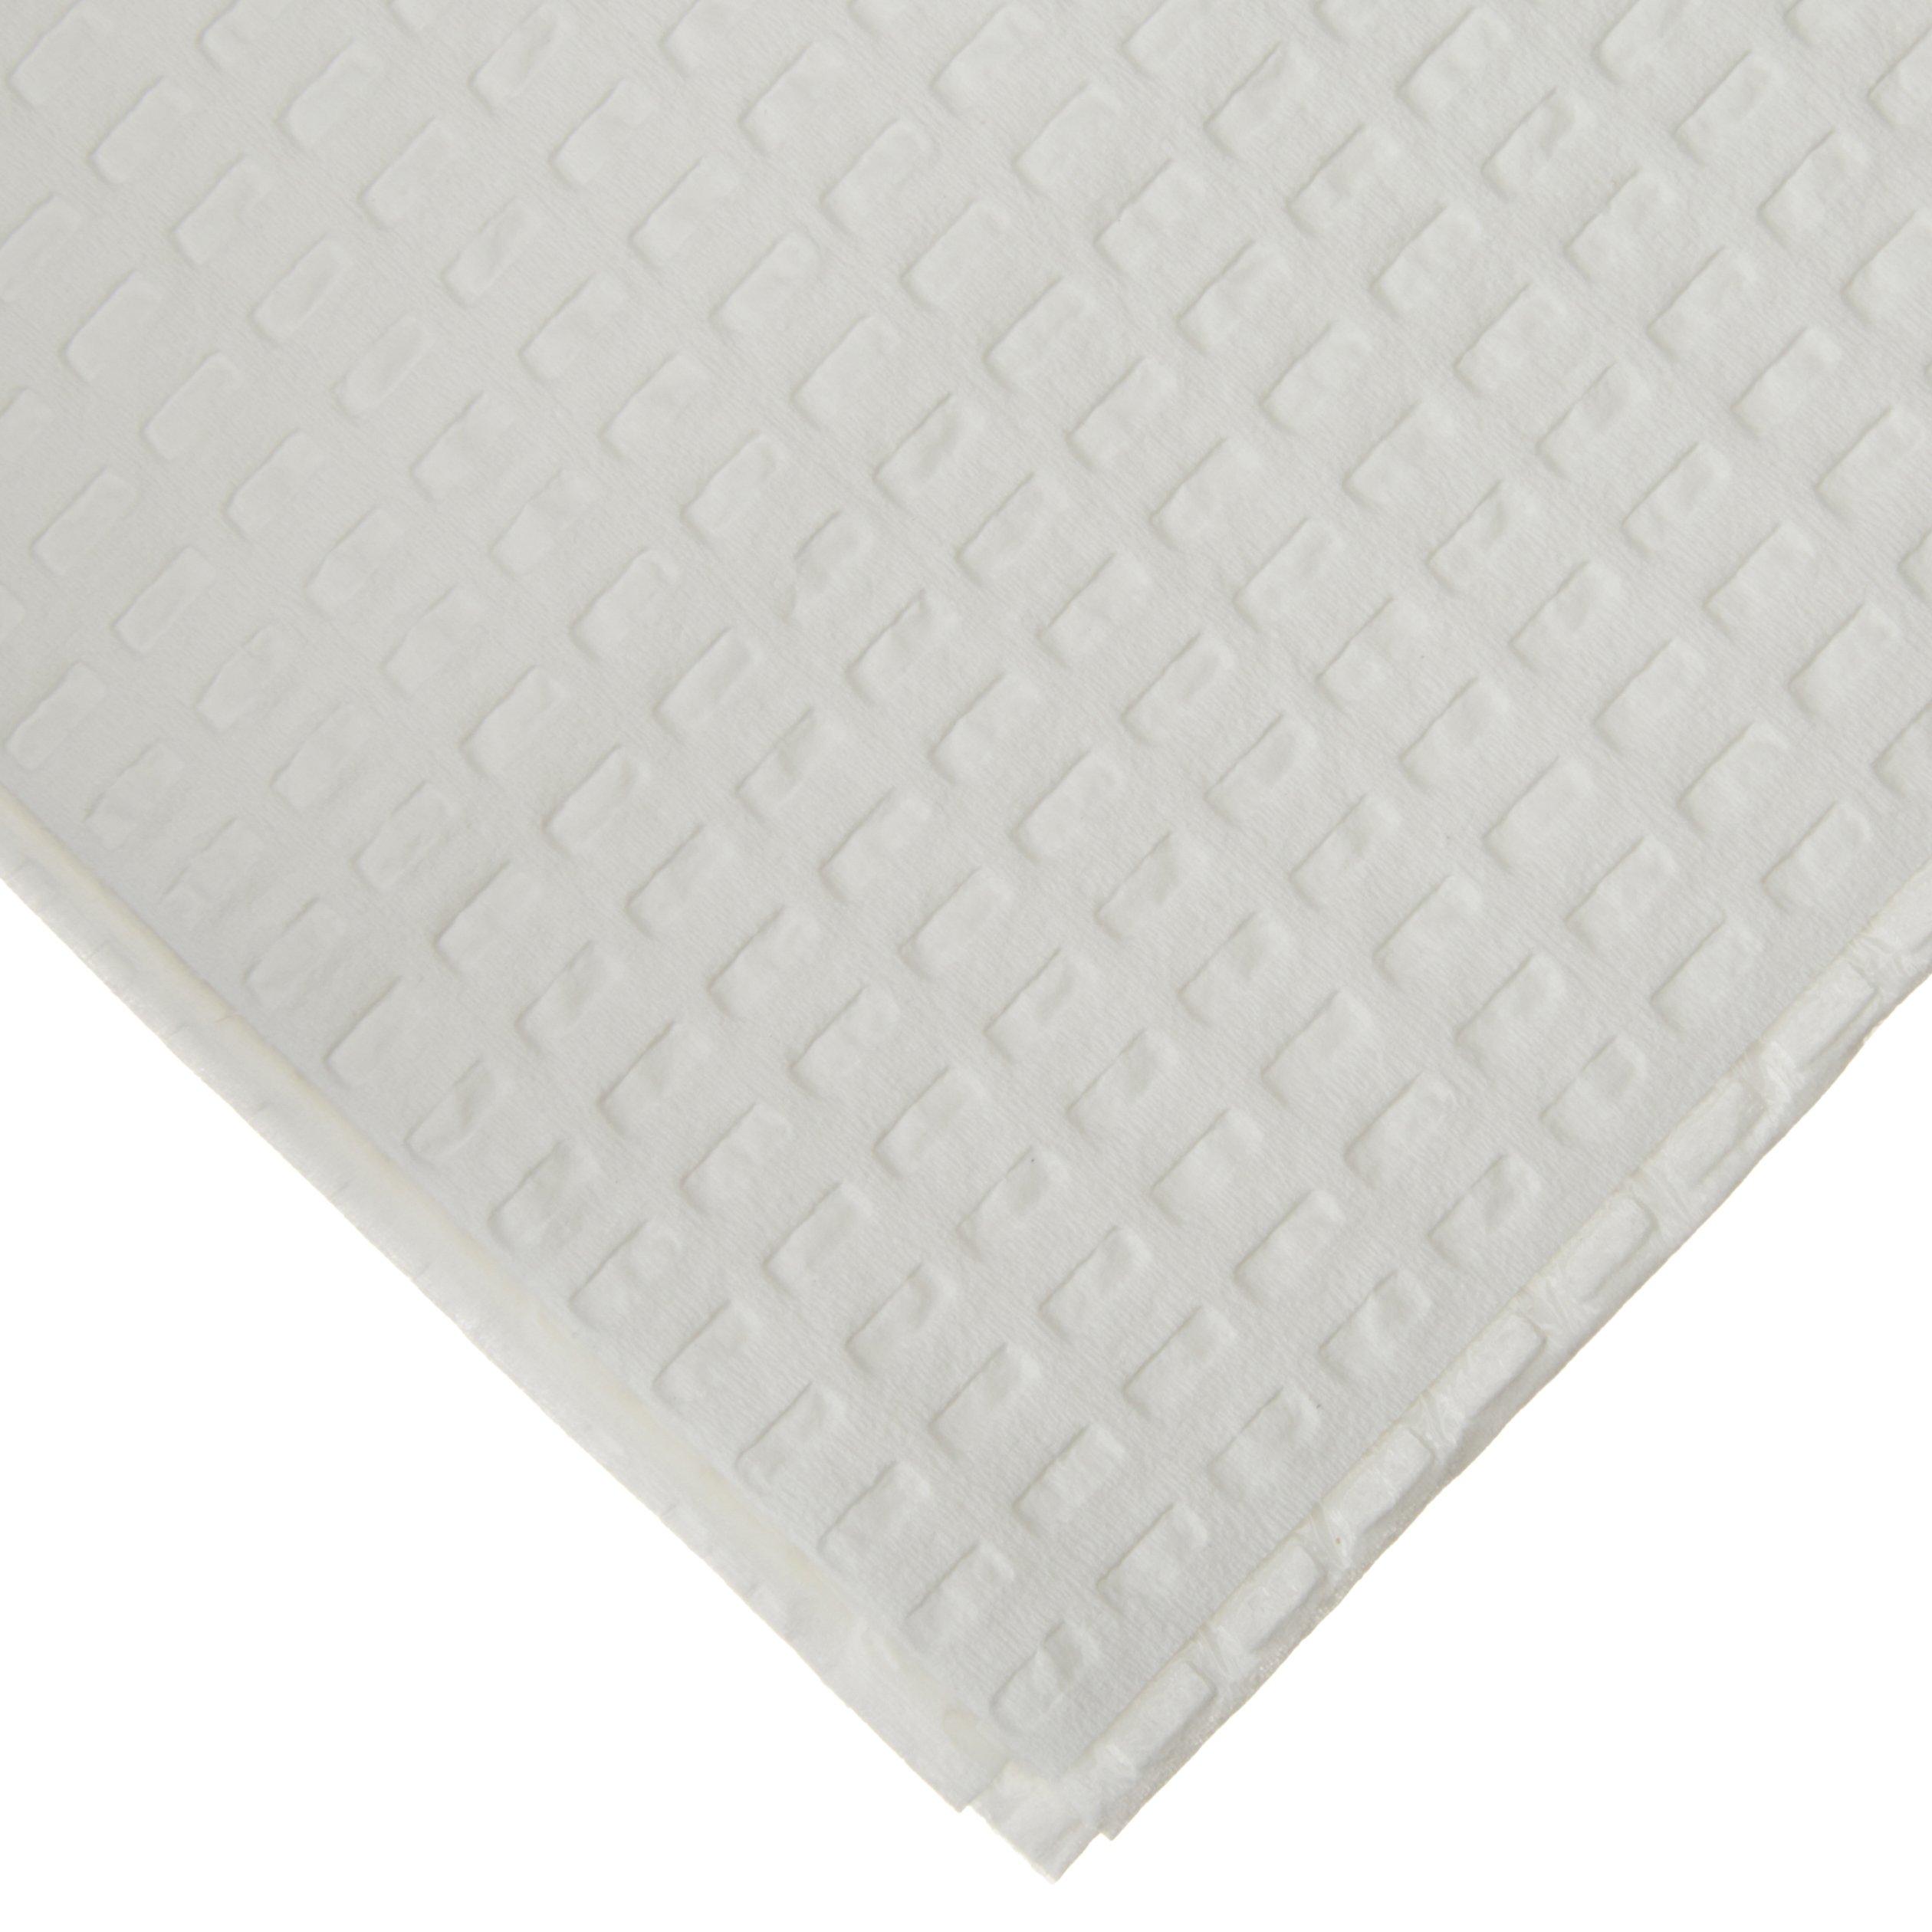 TIDI 3Ply Tissue/Poly White Dental Towel/Bib